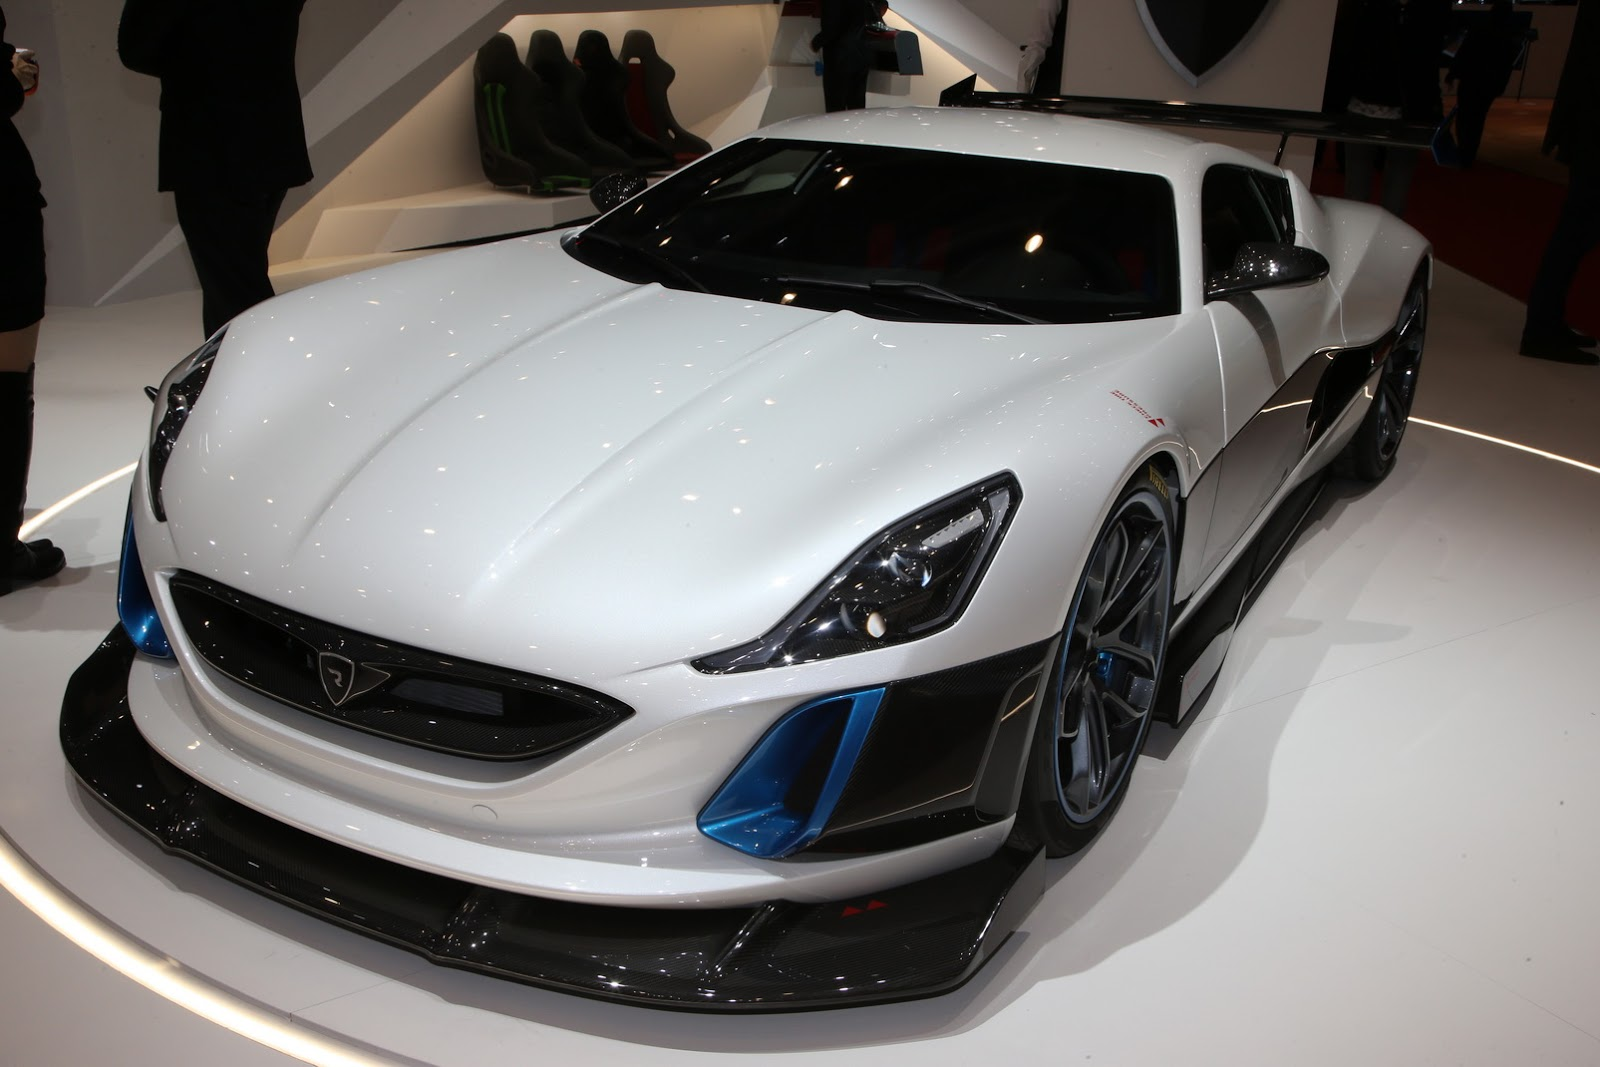 Siêu xe Rimac Concept S